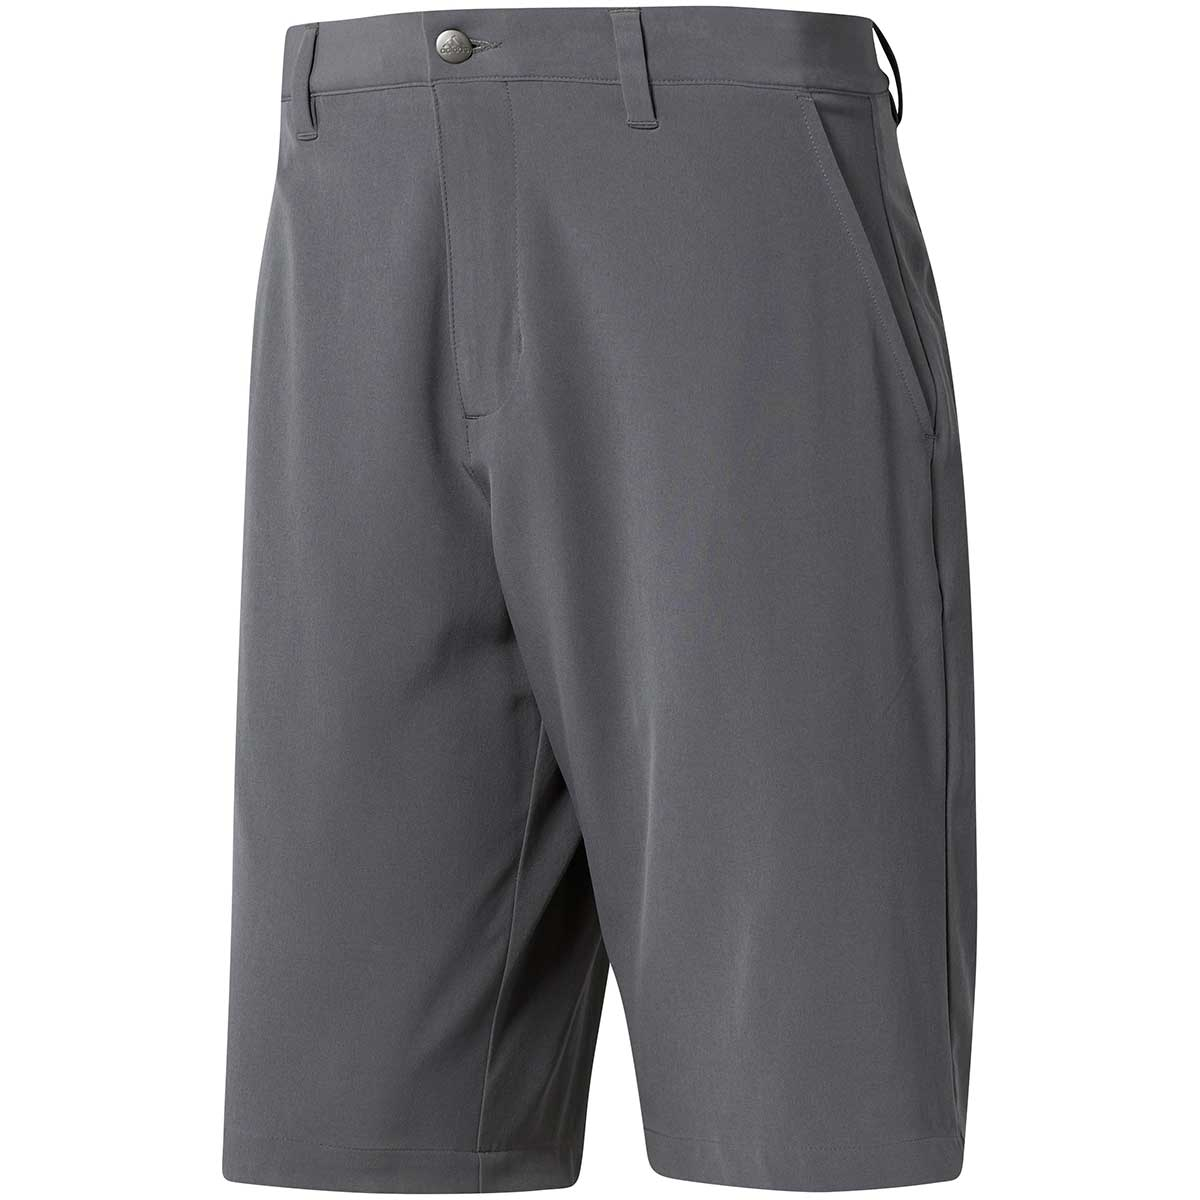 Adidas 2018 Ultimate 365 Solid Short - Grey Five